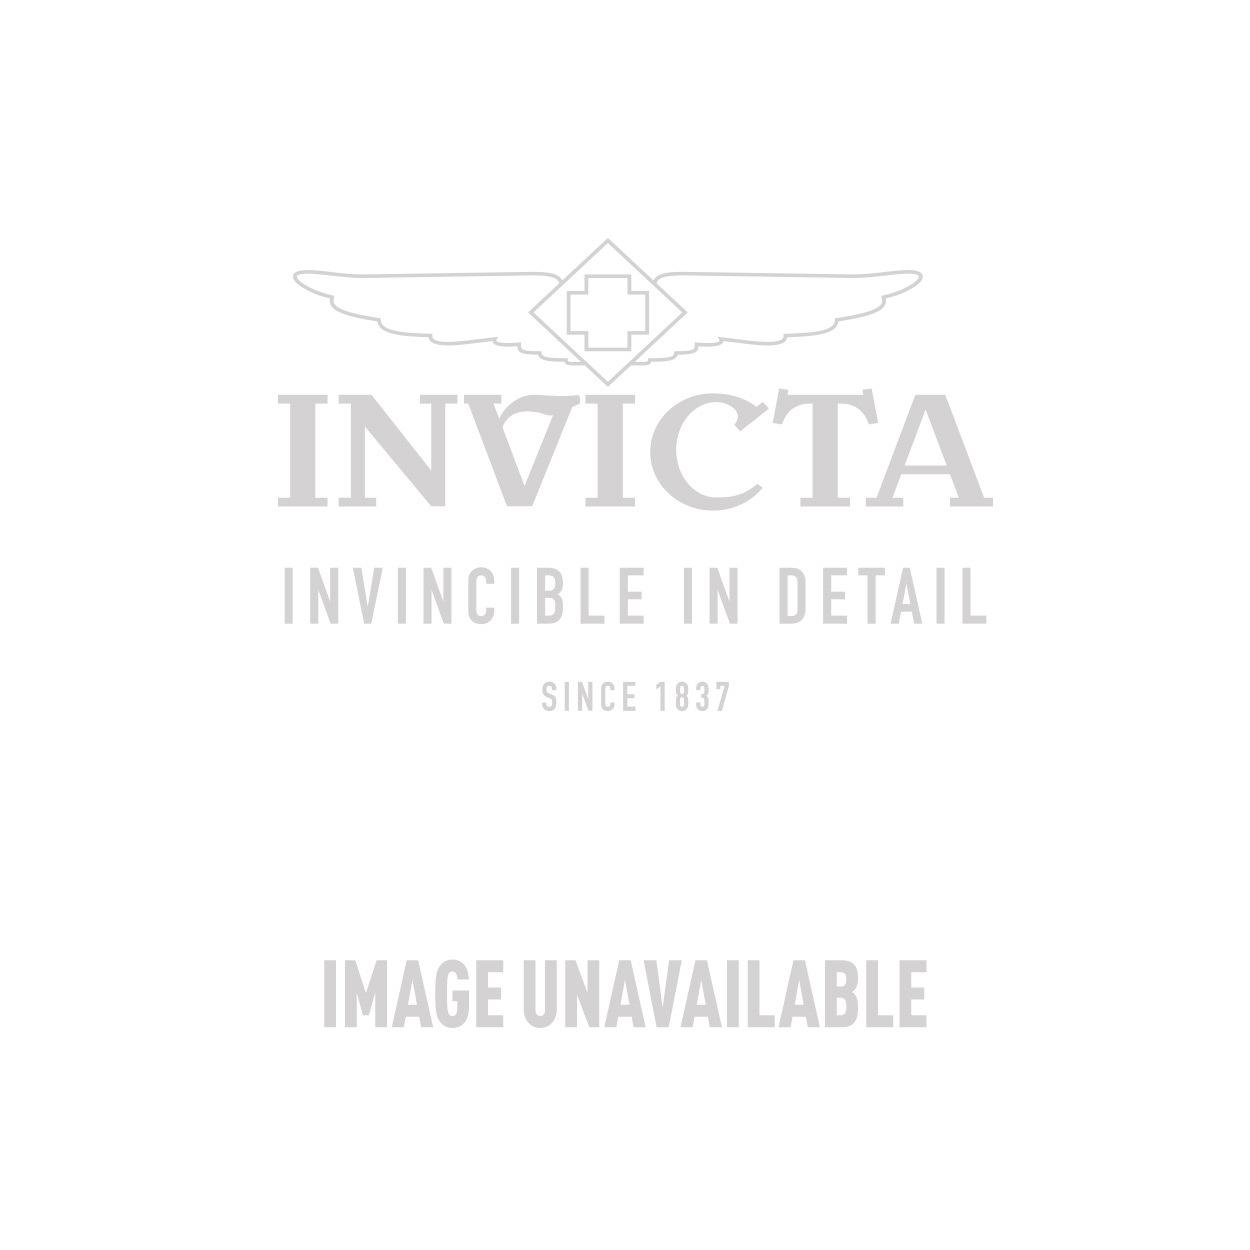 Invicta Subaqua  NOMA V Mens Quartz 50mm Silver Case  Stainless Steel Dial Model  - 12886